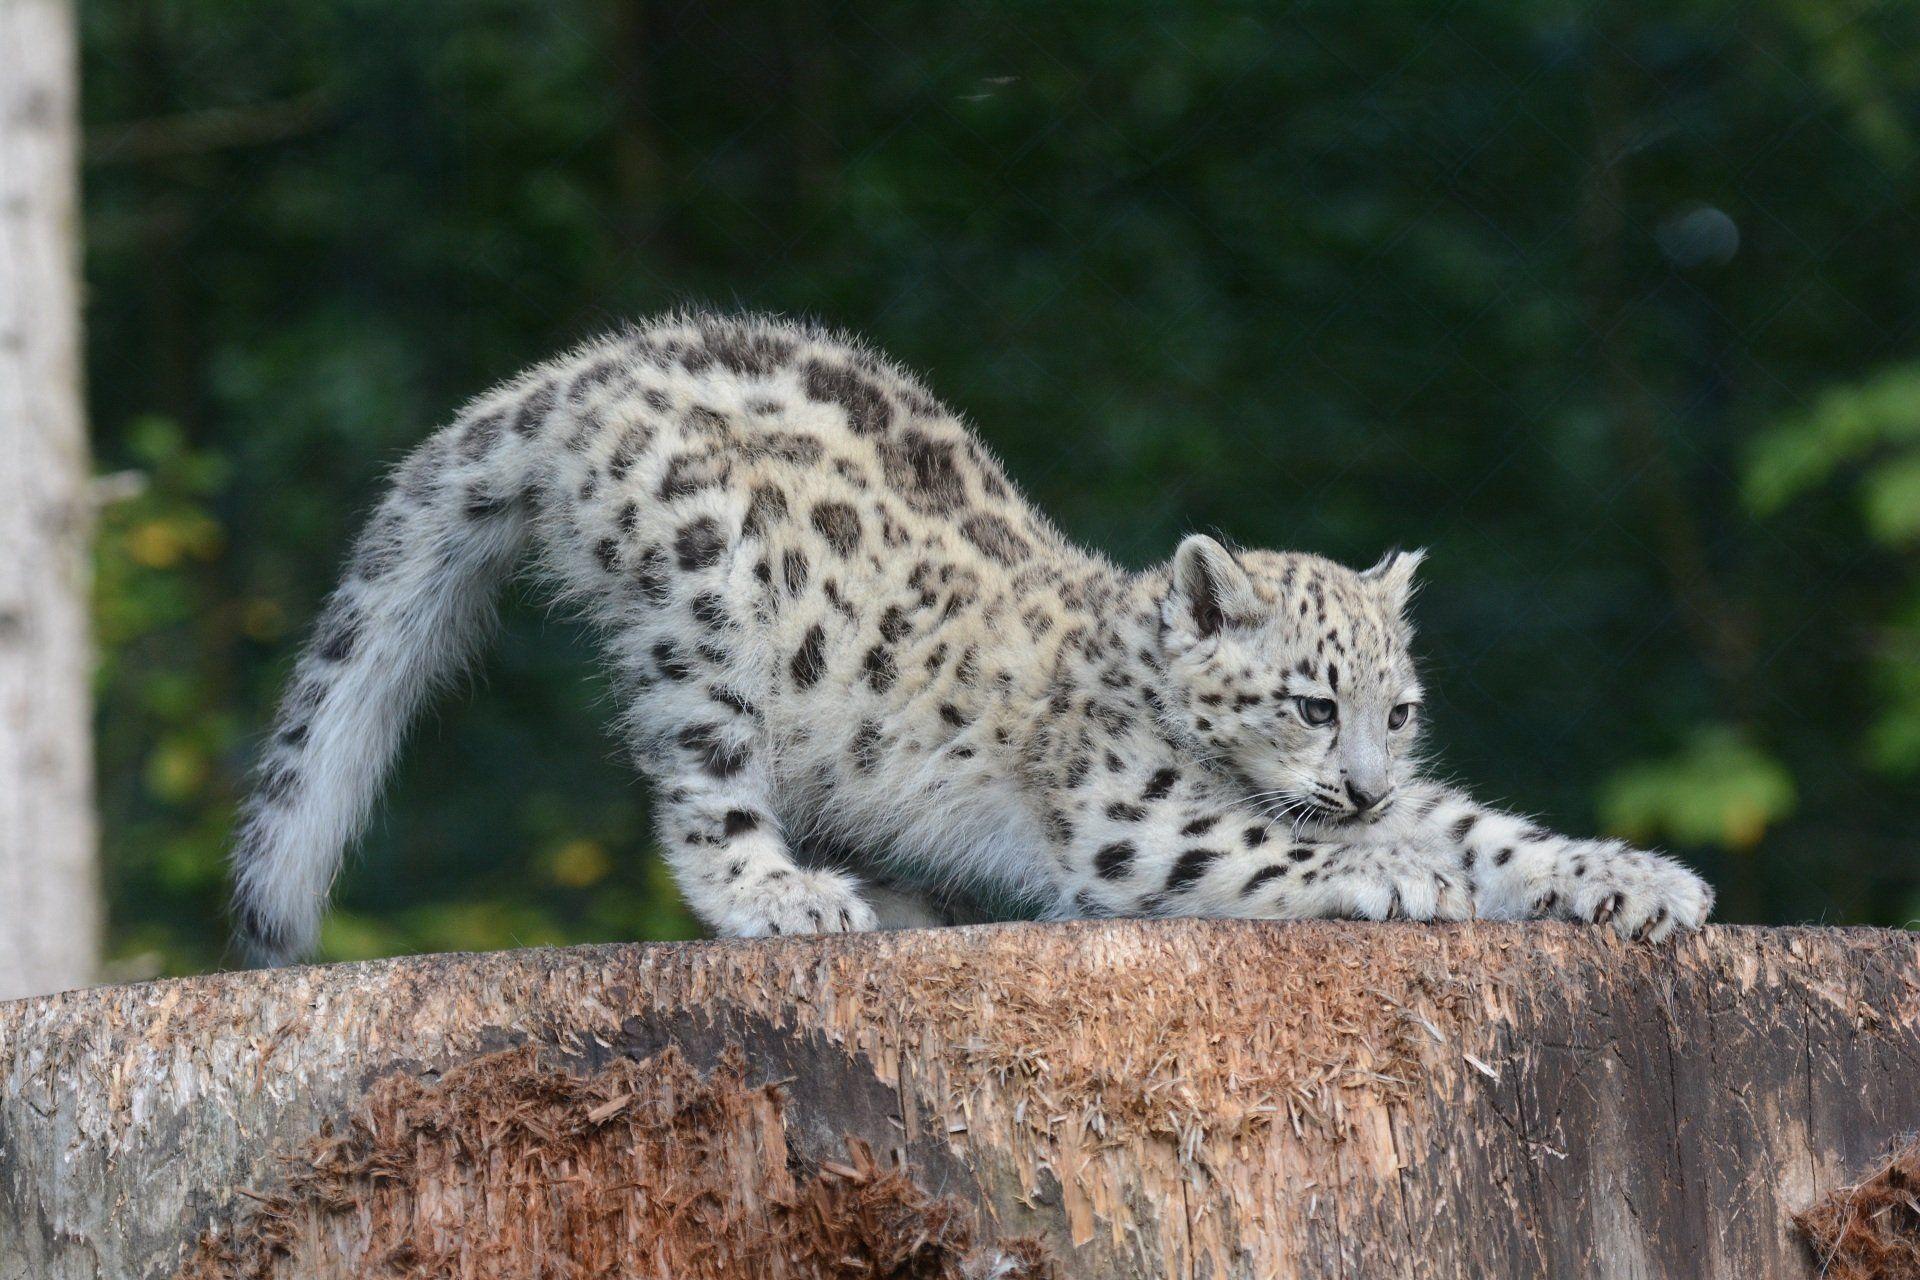 Cute Baby Snow Leopard Wallpaper